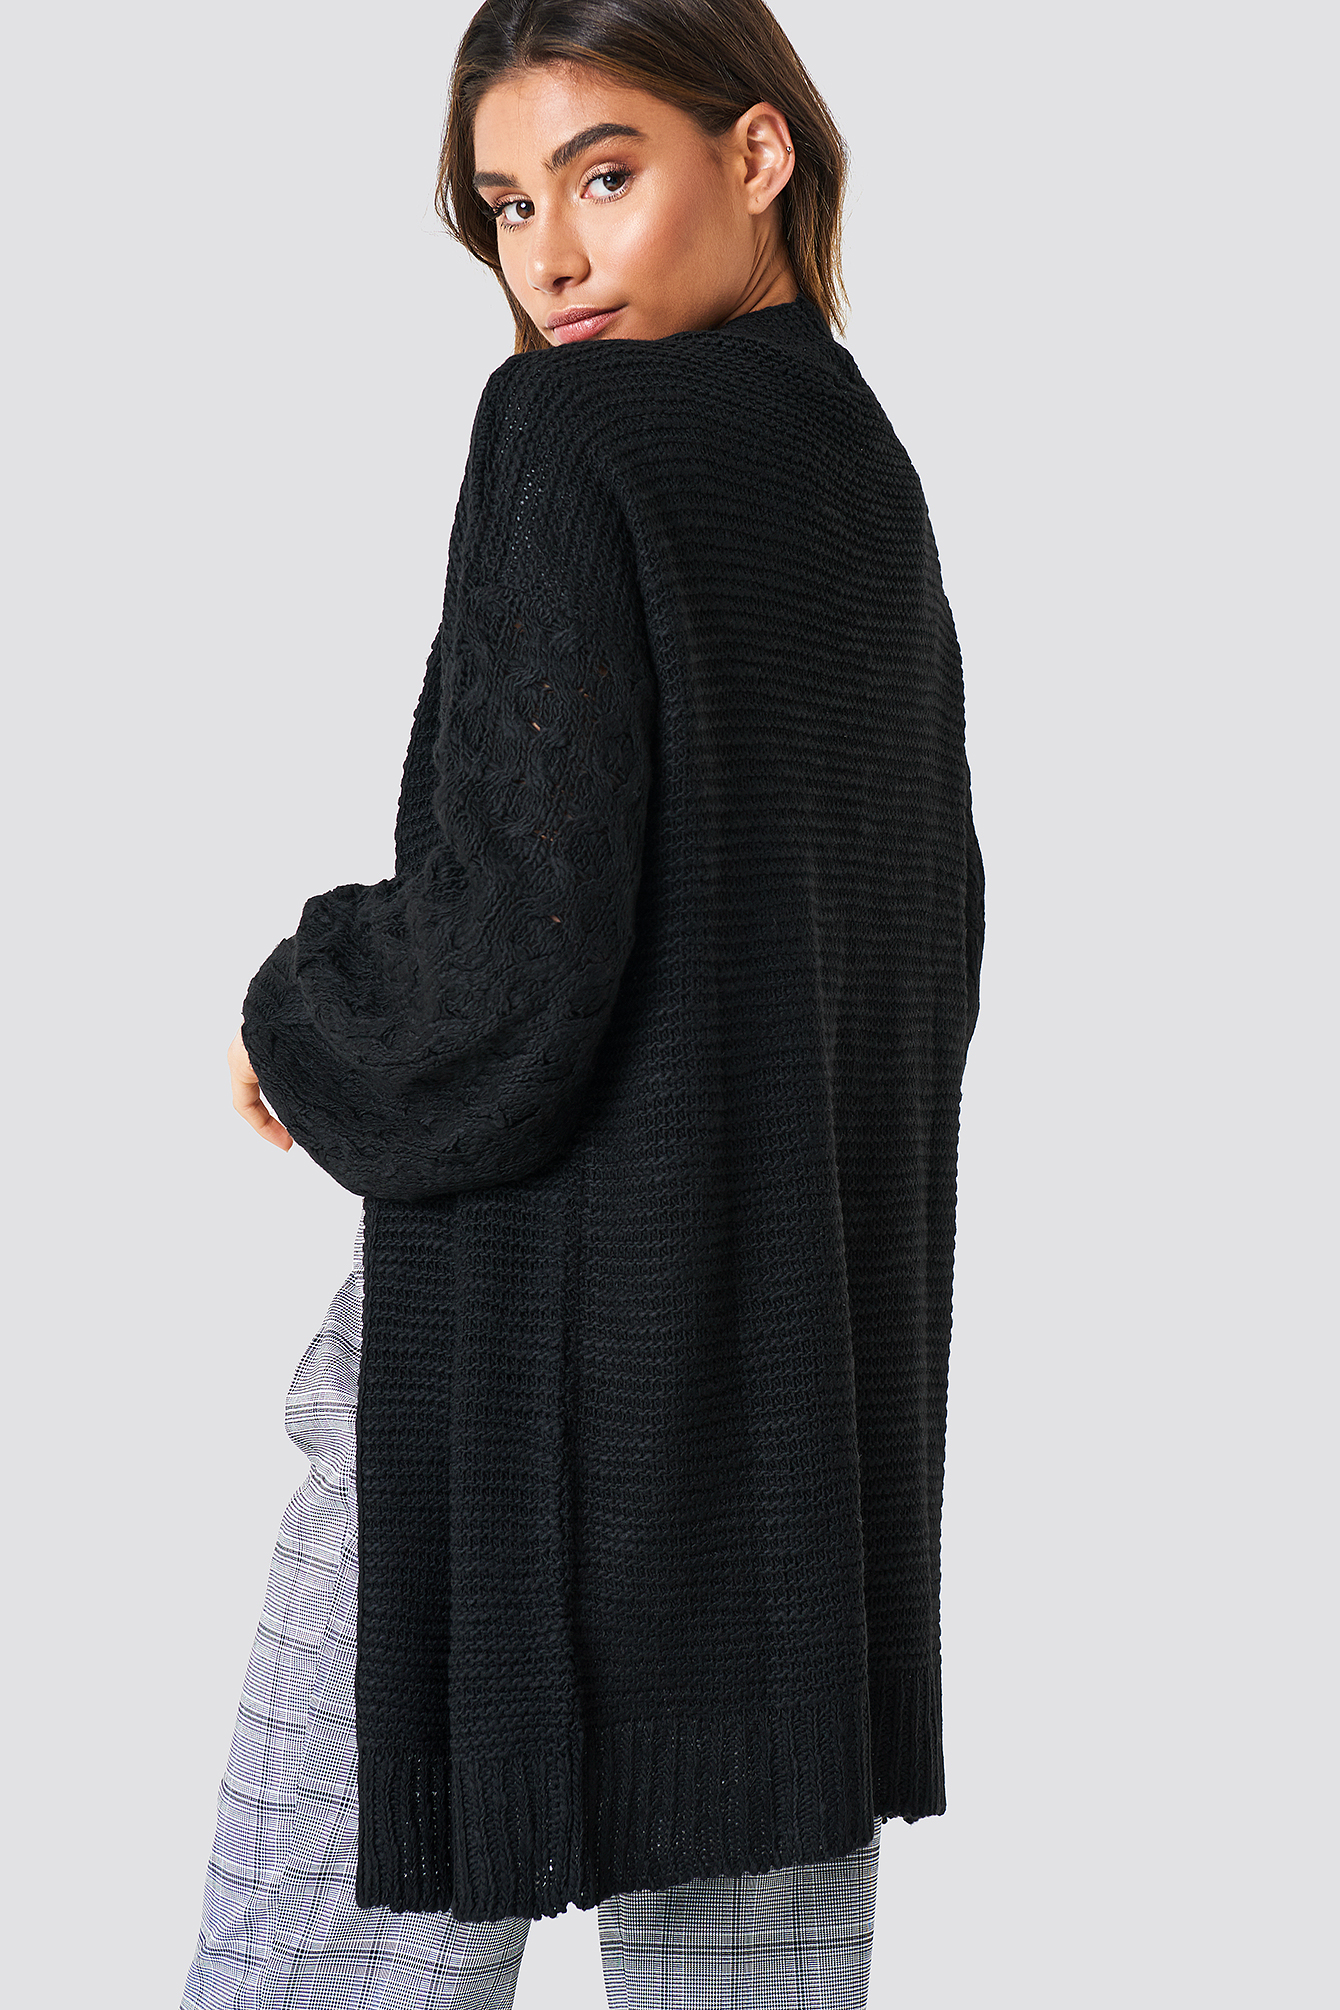 Links Links Knitted Cardigan NA-KD.COM